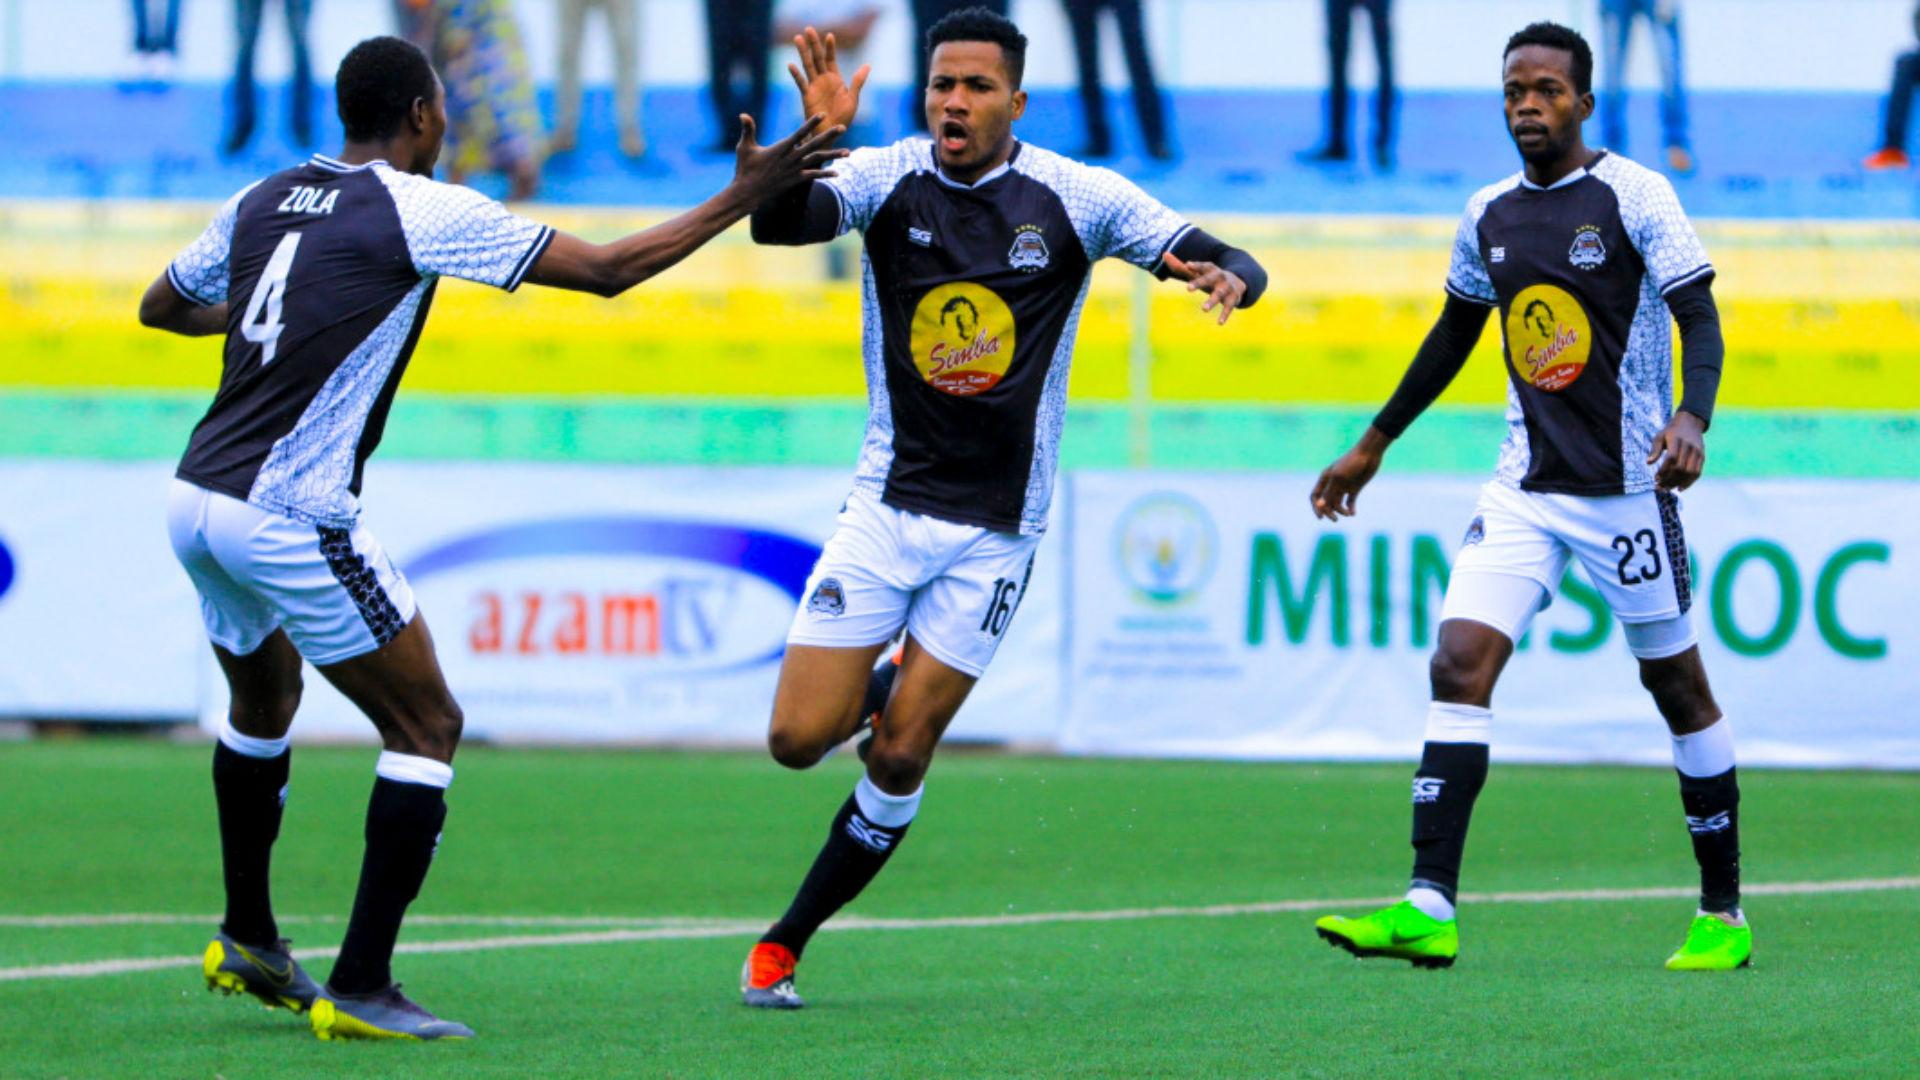 Caf Champions League: TP Mazembe smash SC Zamalek, Mamelodi Sundowns win |  Goal.com